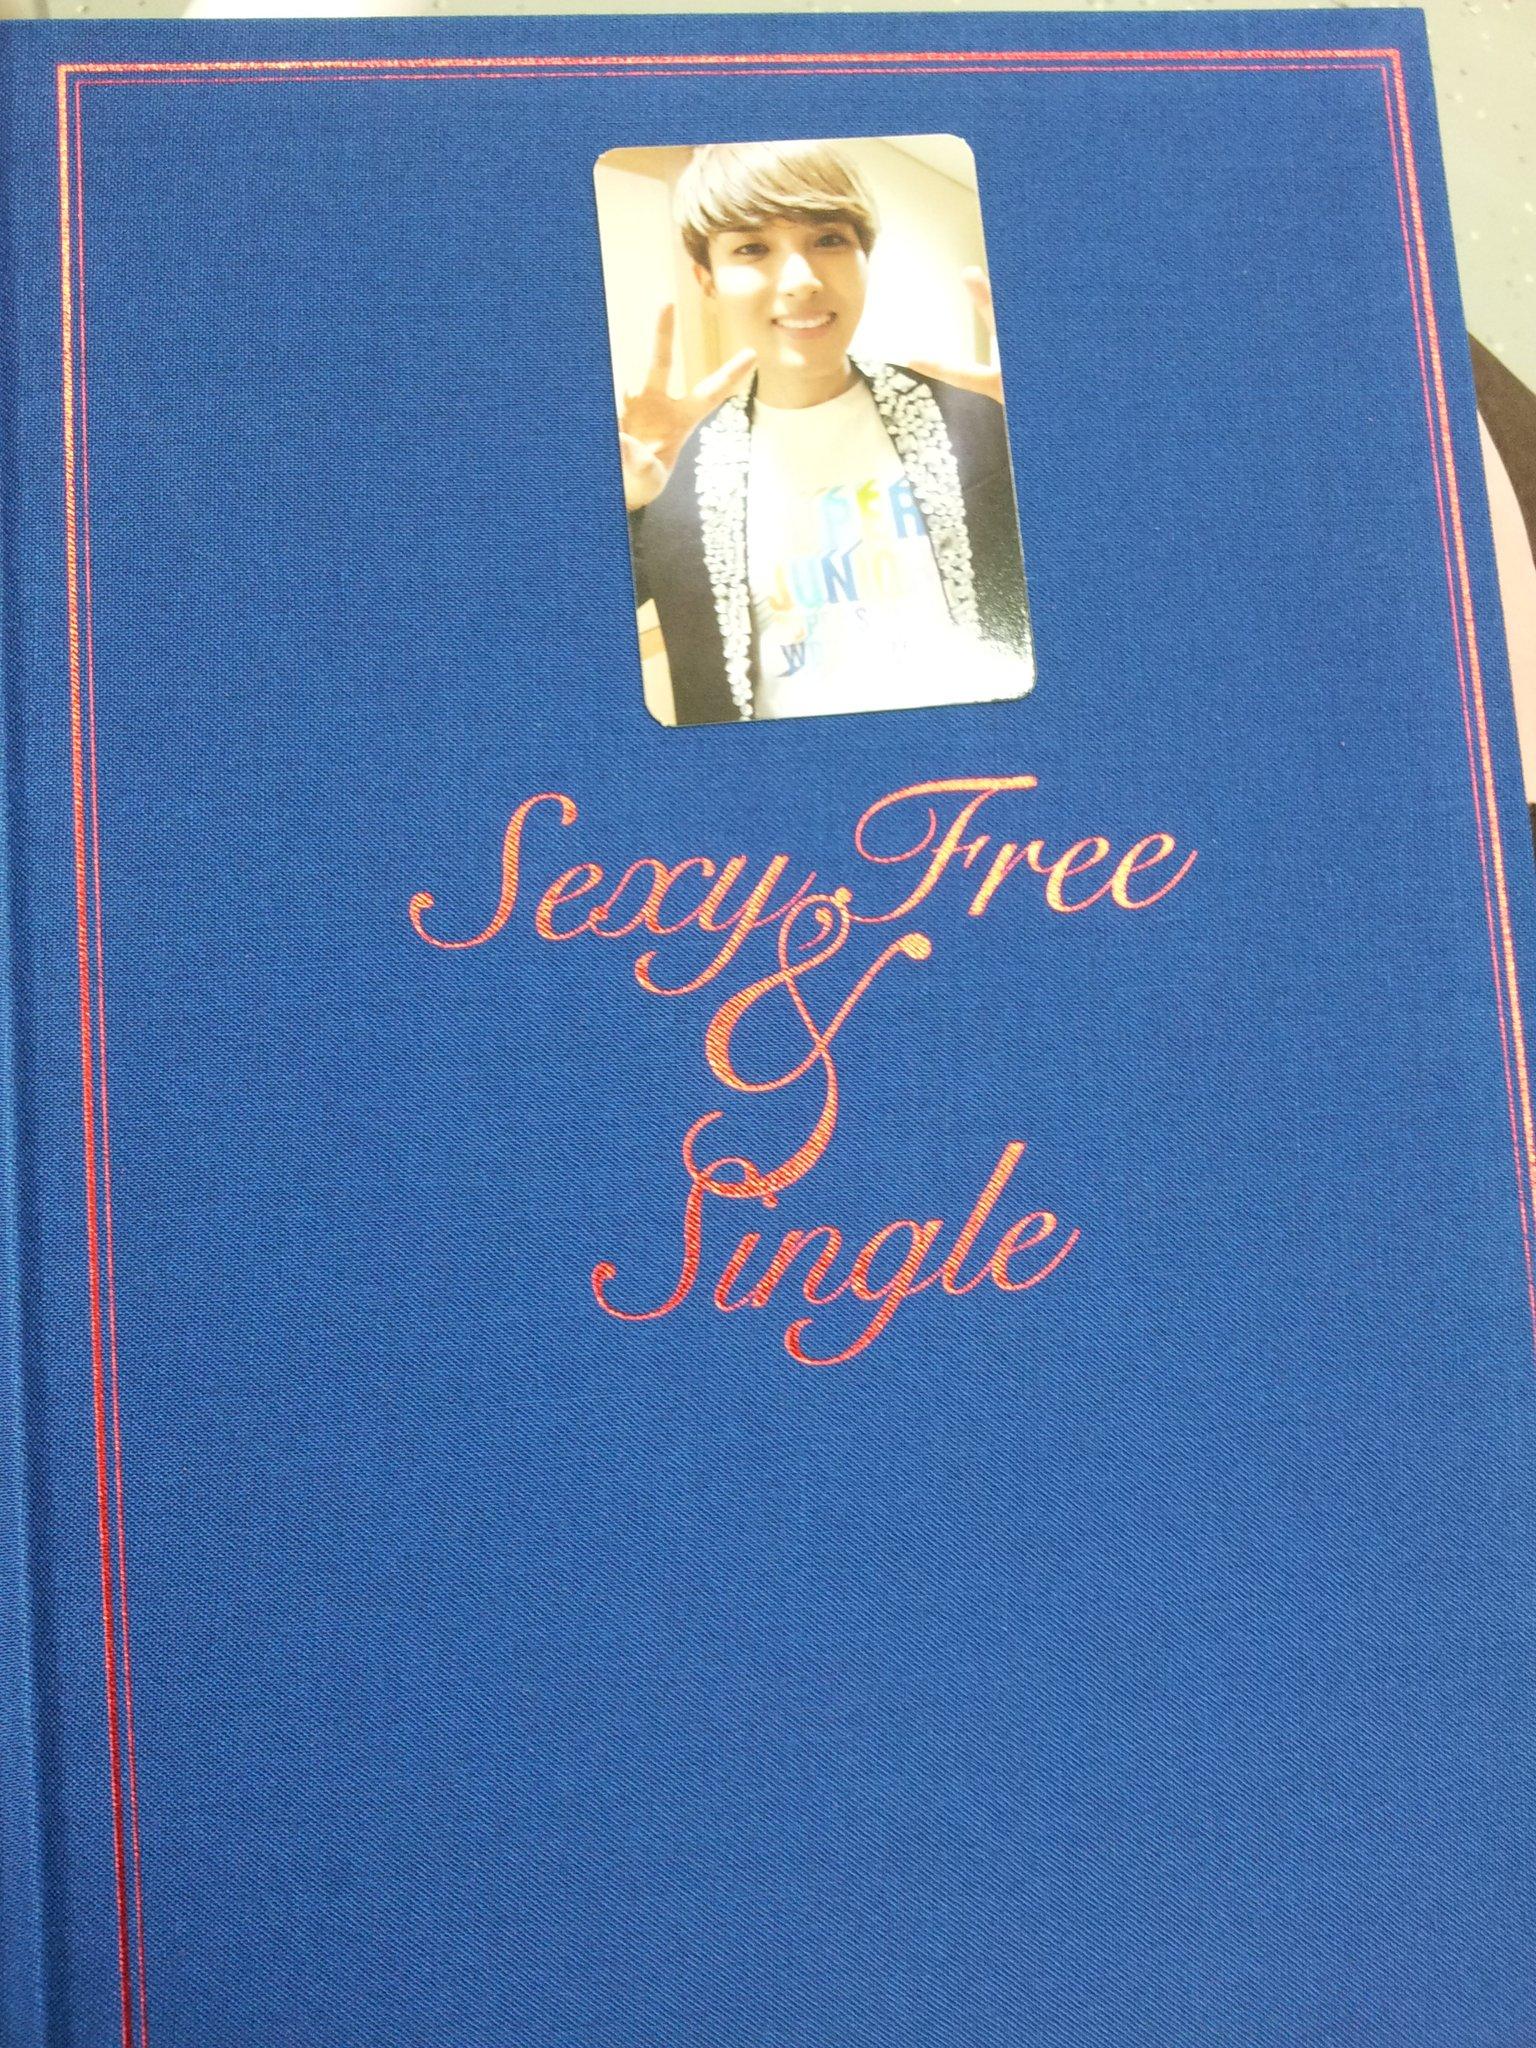 [PIC] 'Sexy, Free & Single' Ryeowook Photocard! http://t.co/1kI6u0KF cr: 712jay